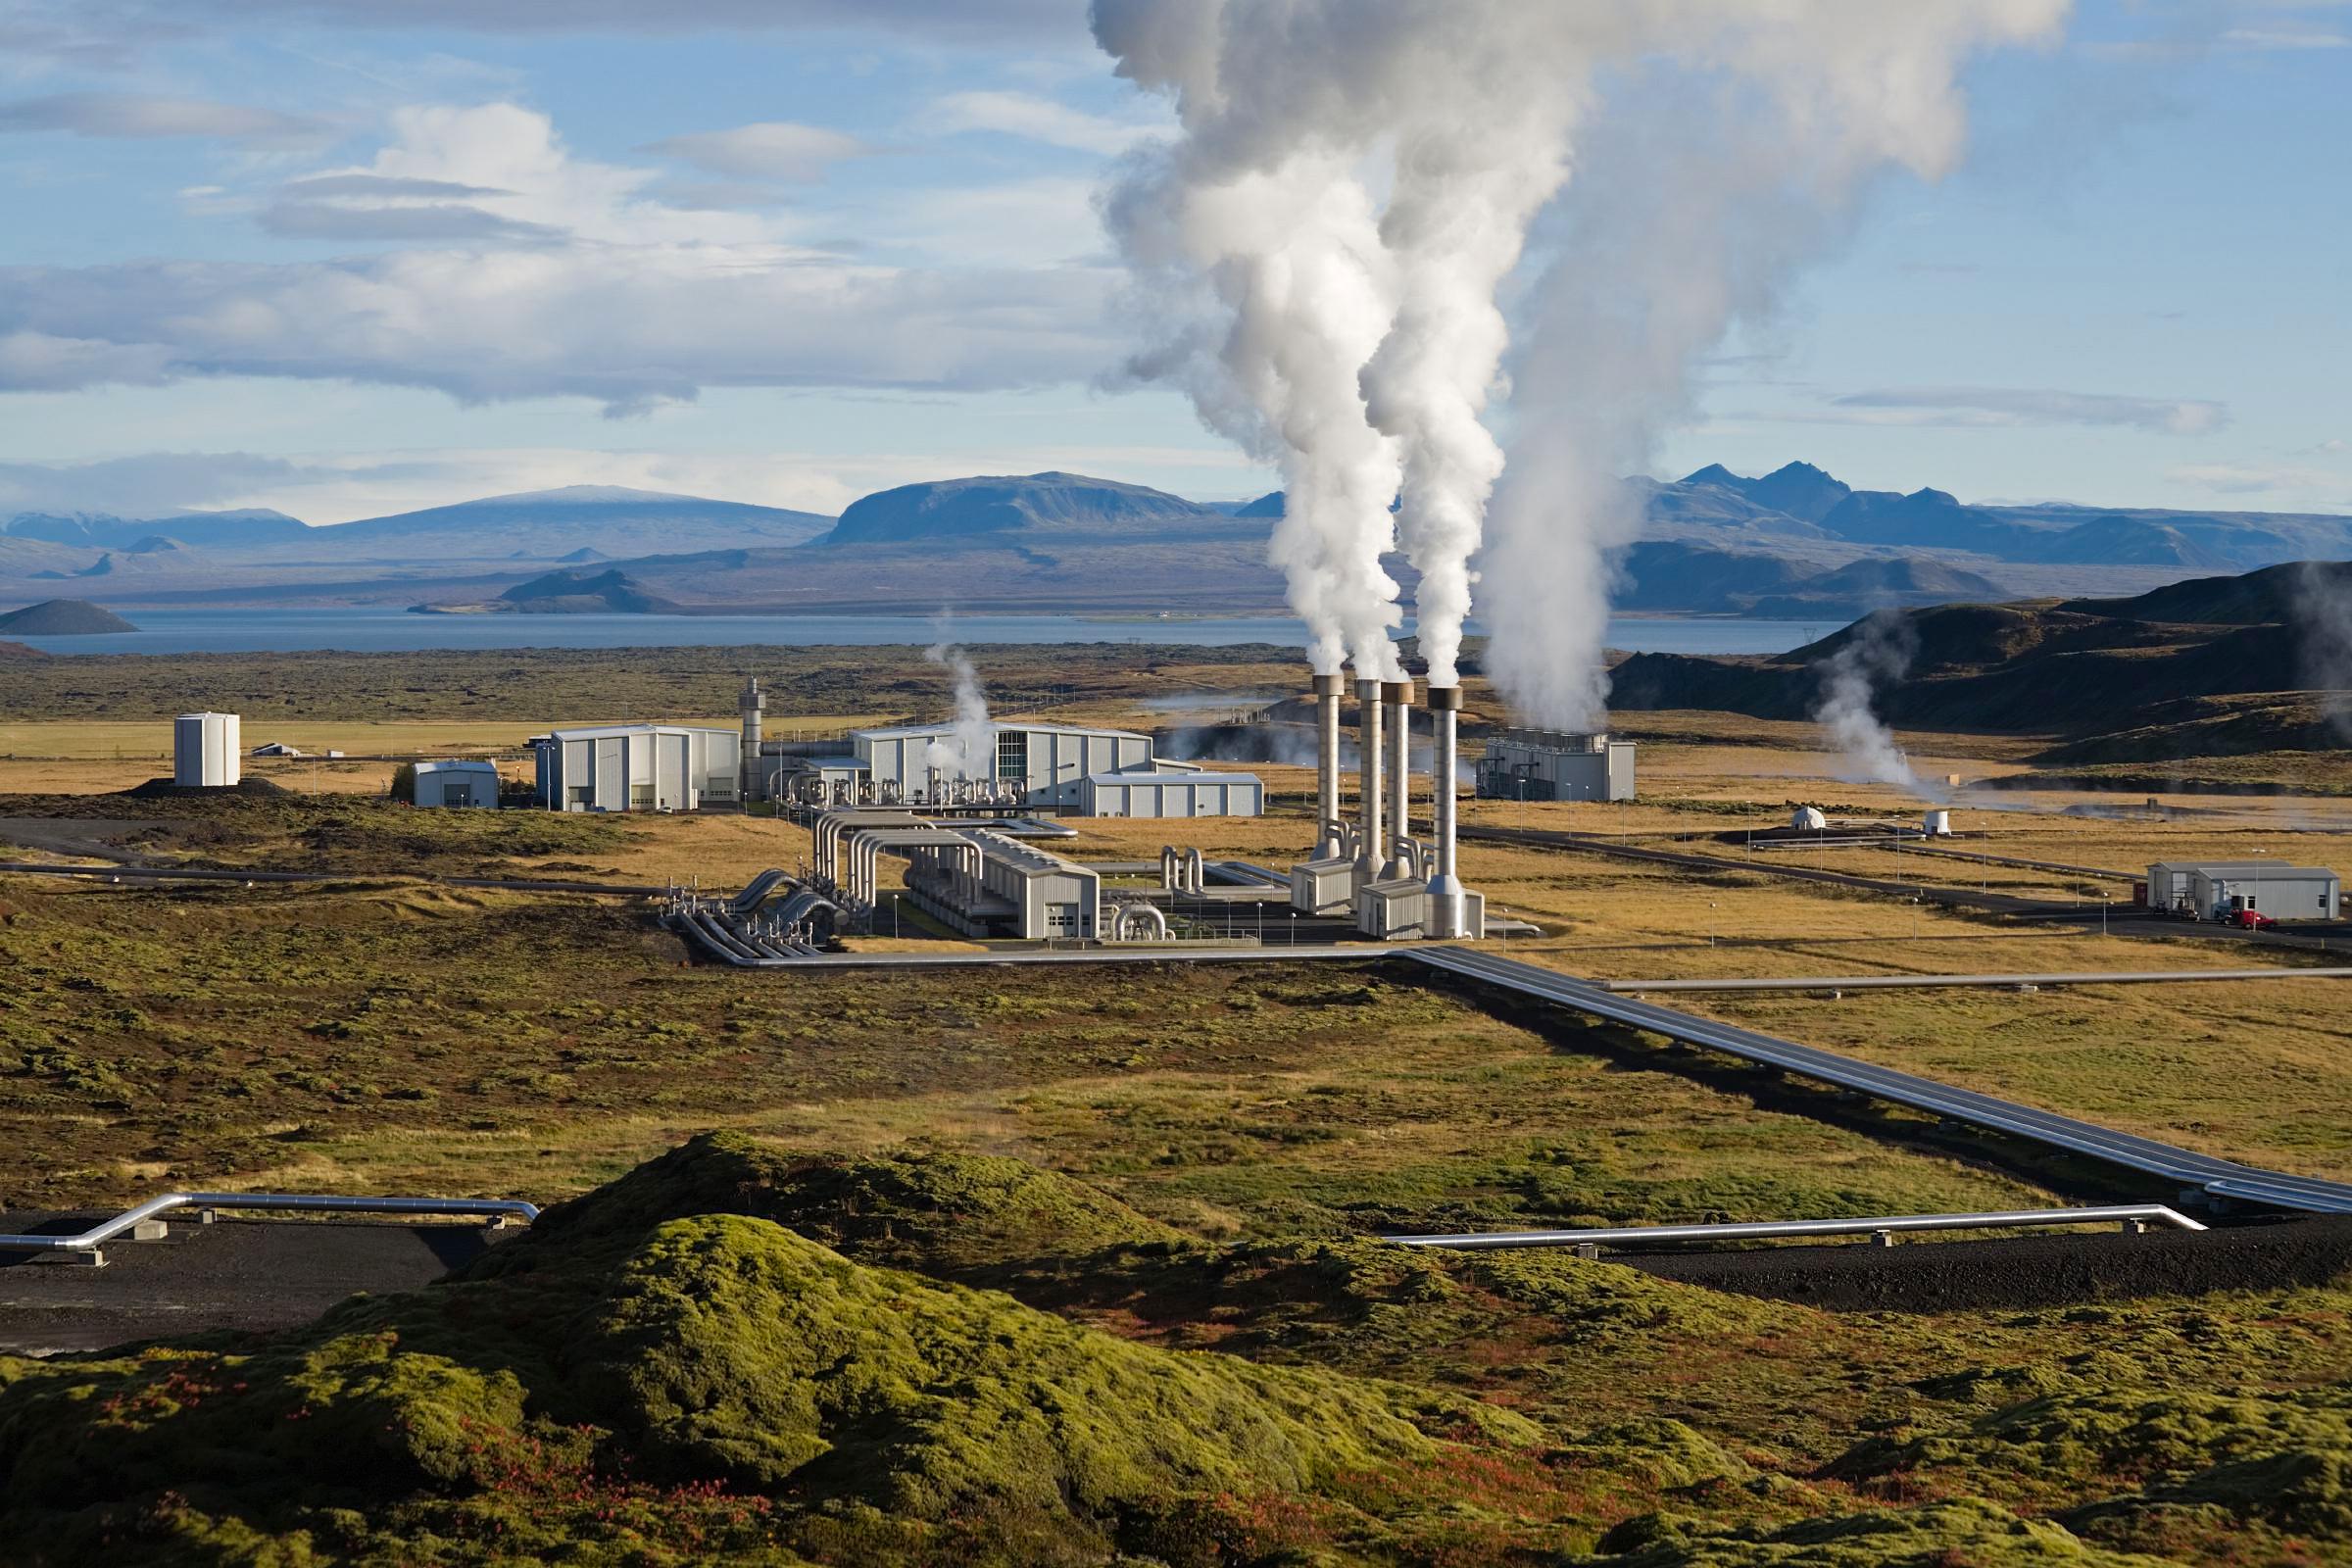 Geotermalna elektrana Nesjavellir na Islandu. Izvor: https://en.wikipedia.org/wiki/Geothermal_electricity#/media/File:NesjavellirPowerPlant_edit2.jpg